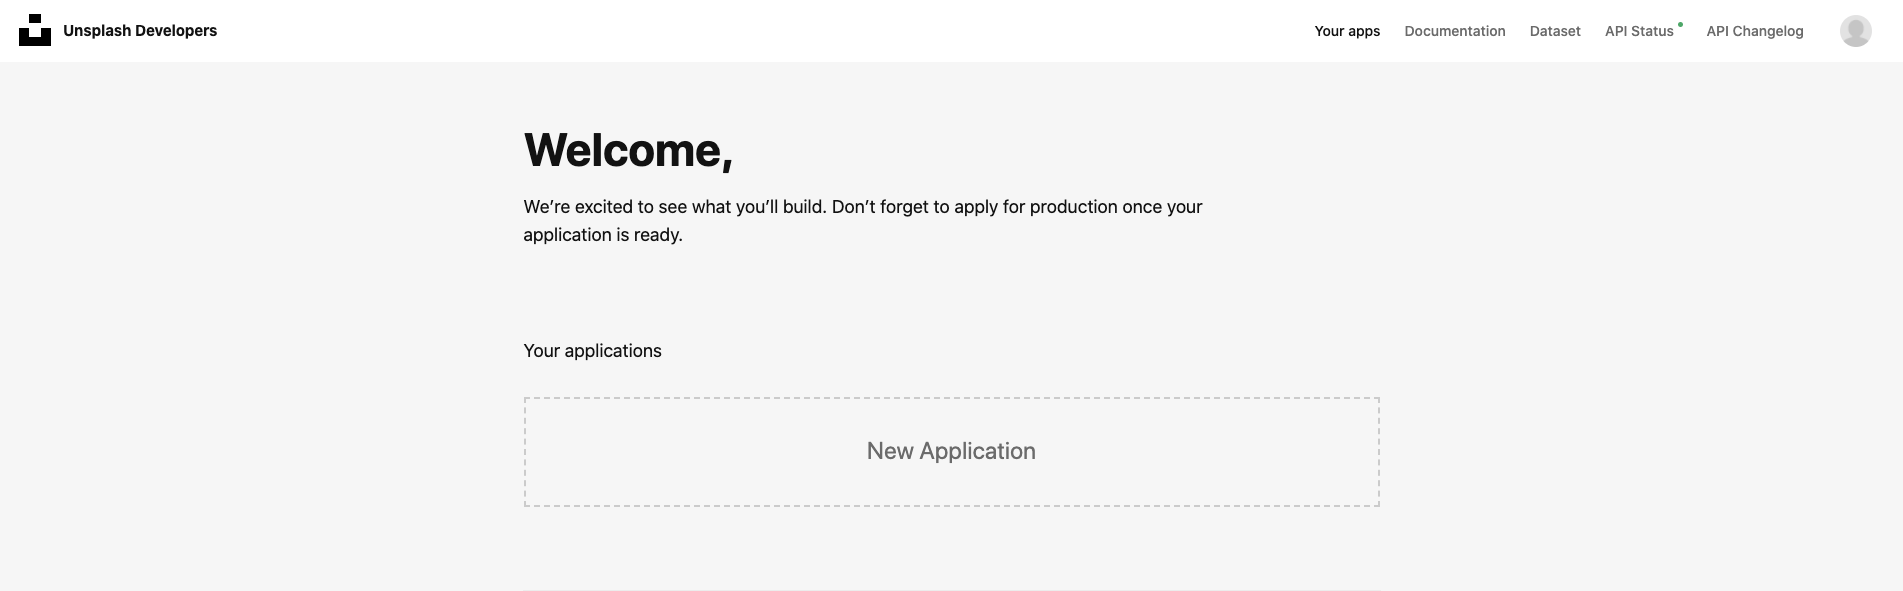 Unsplash Developer Dashboard with New Application